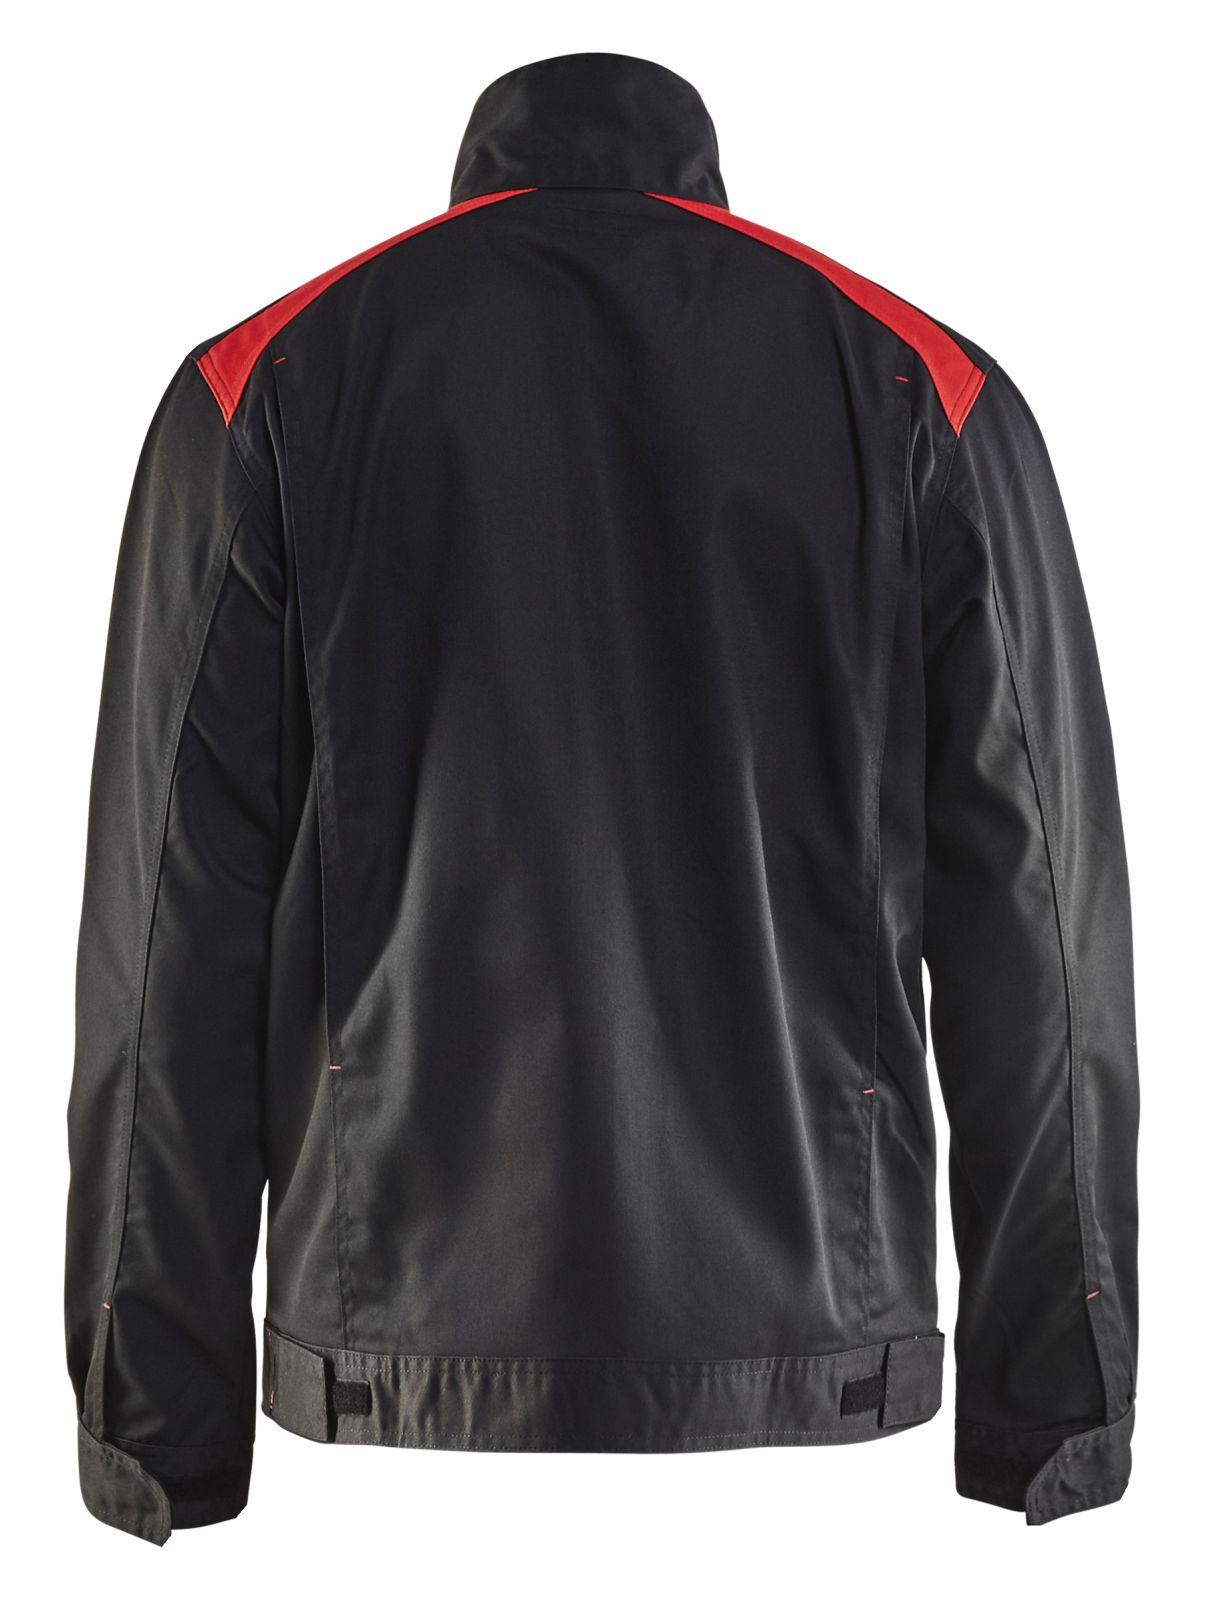 Blaklader Combi-jacks 40541800 zwart-rood(9956)